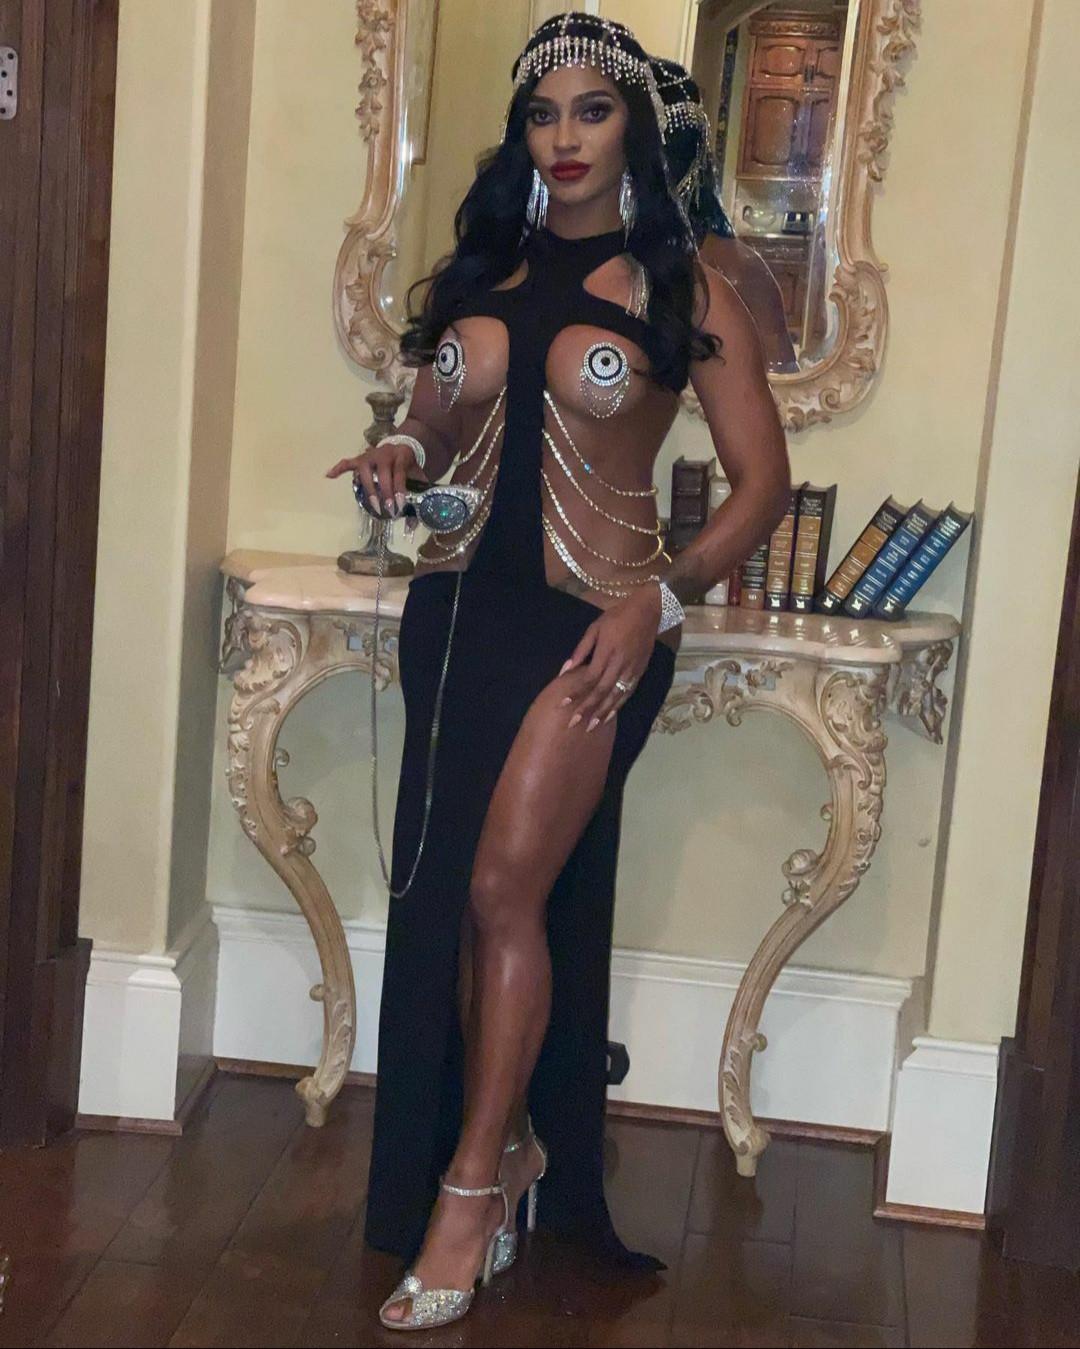 Reality TV star, Joseline Hernandez